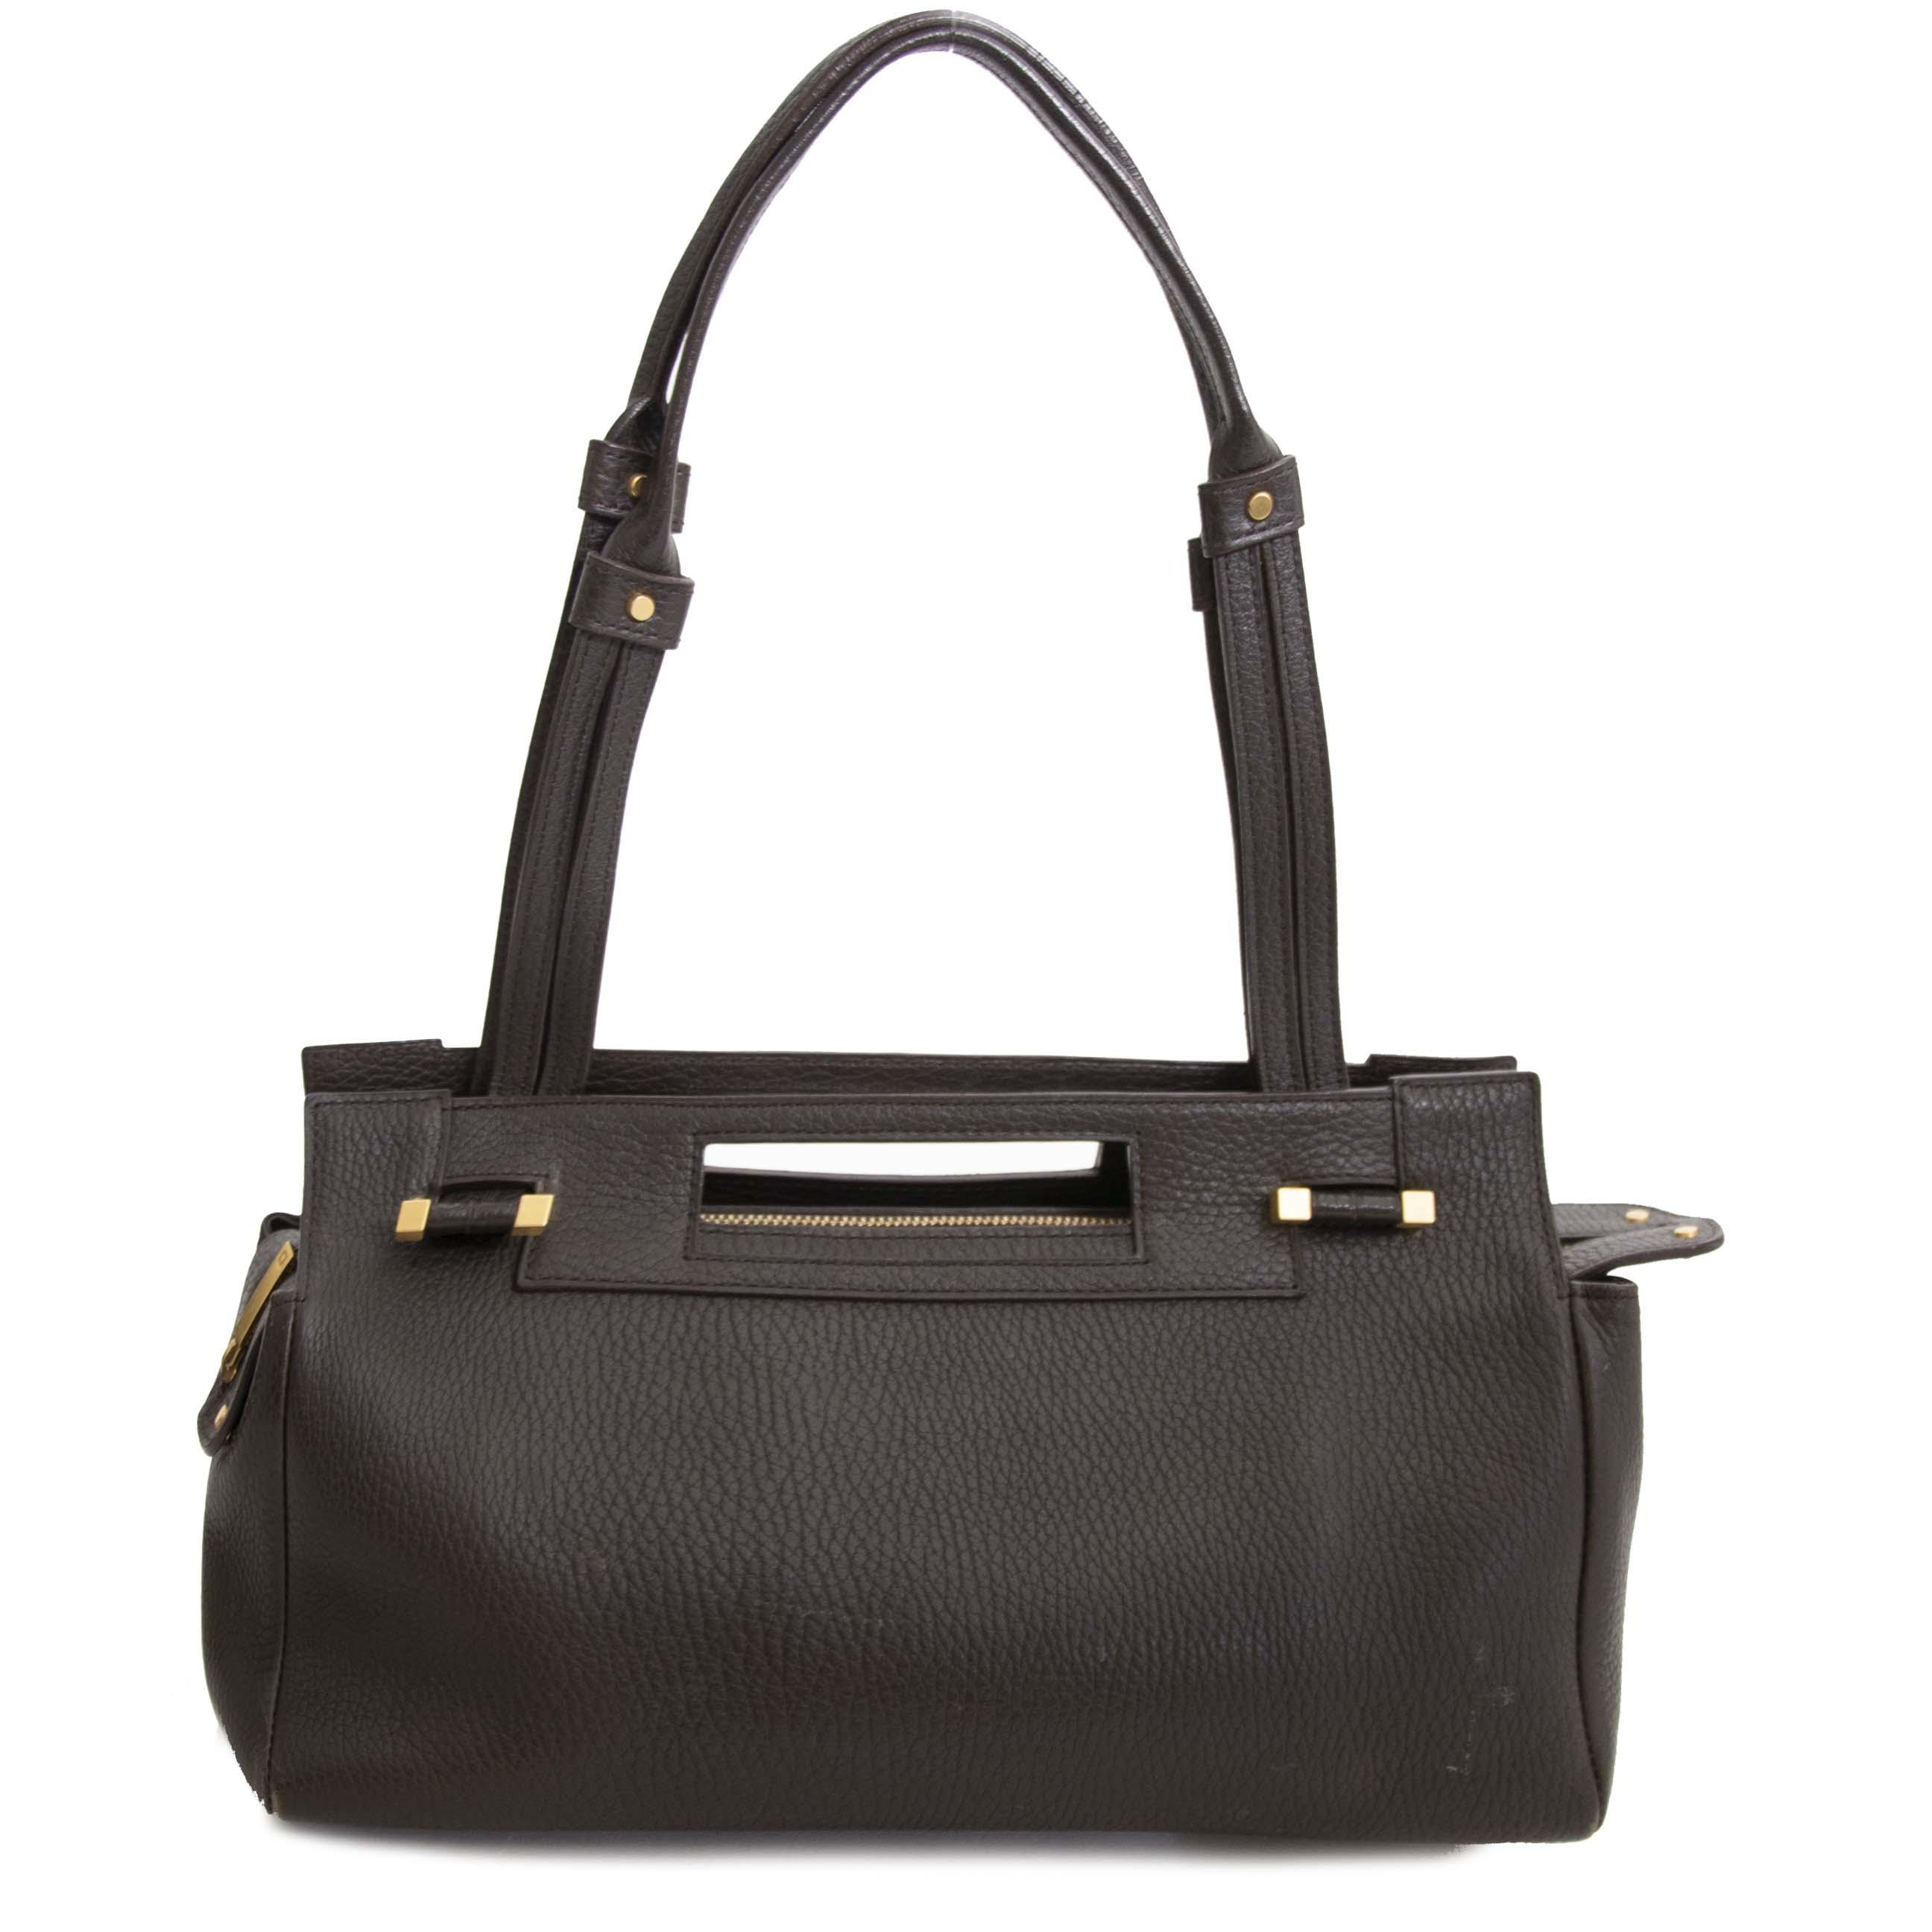 2183922564a45 ... Buy authentic second hand vintage Delvaux Le Benjamin Café Shoulder Bag  at online webshop LabelLOV